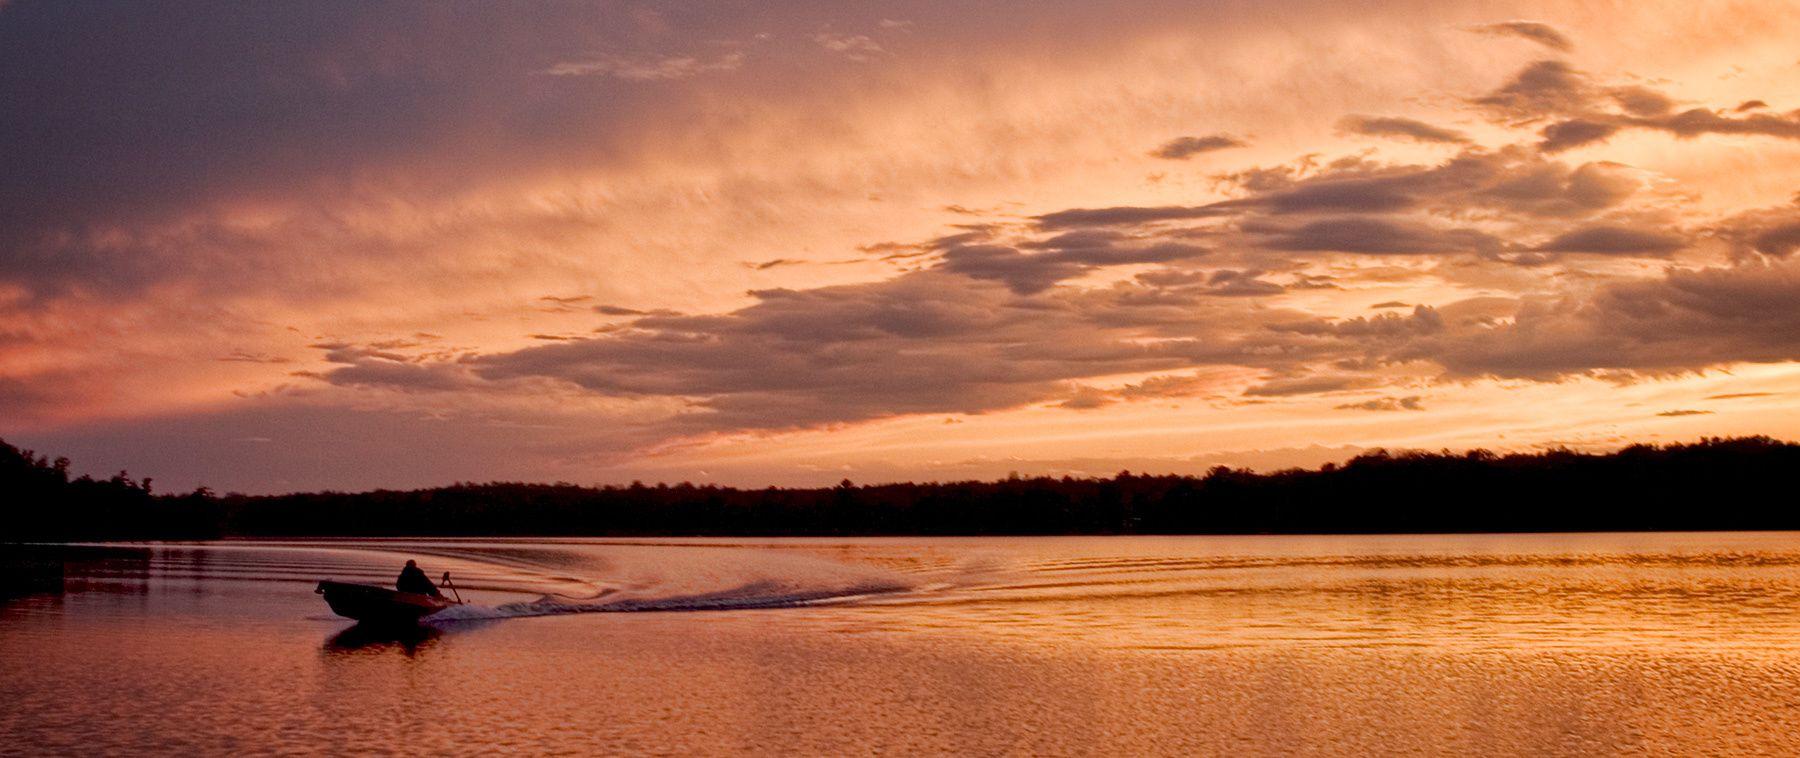 1r1689_letourneau_sunset_boat.jpg